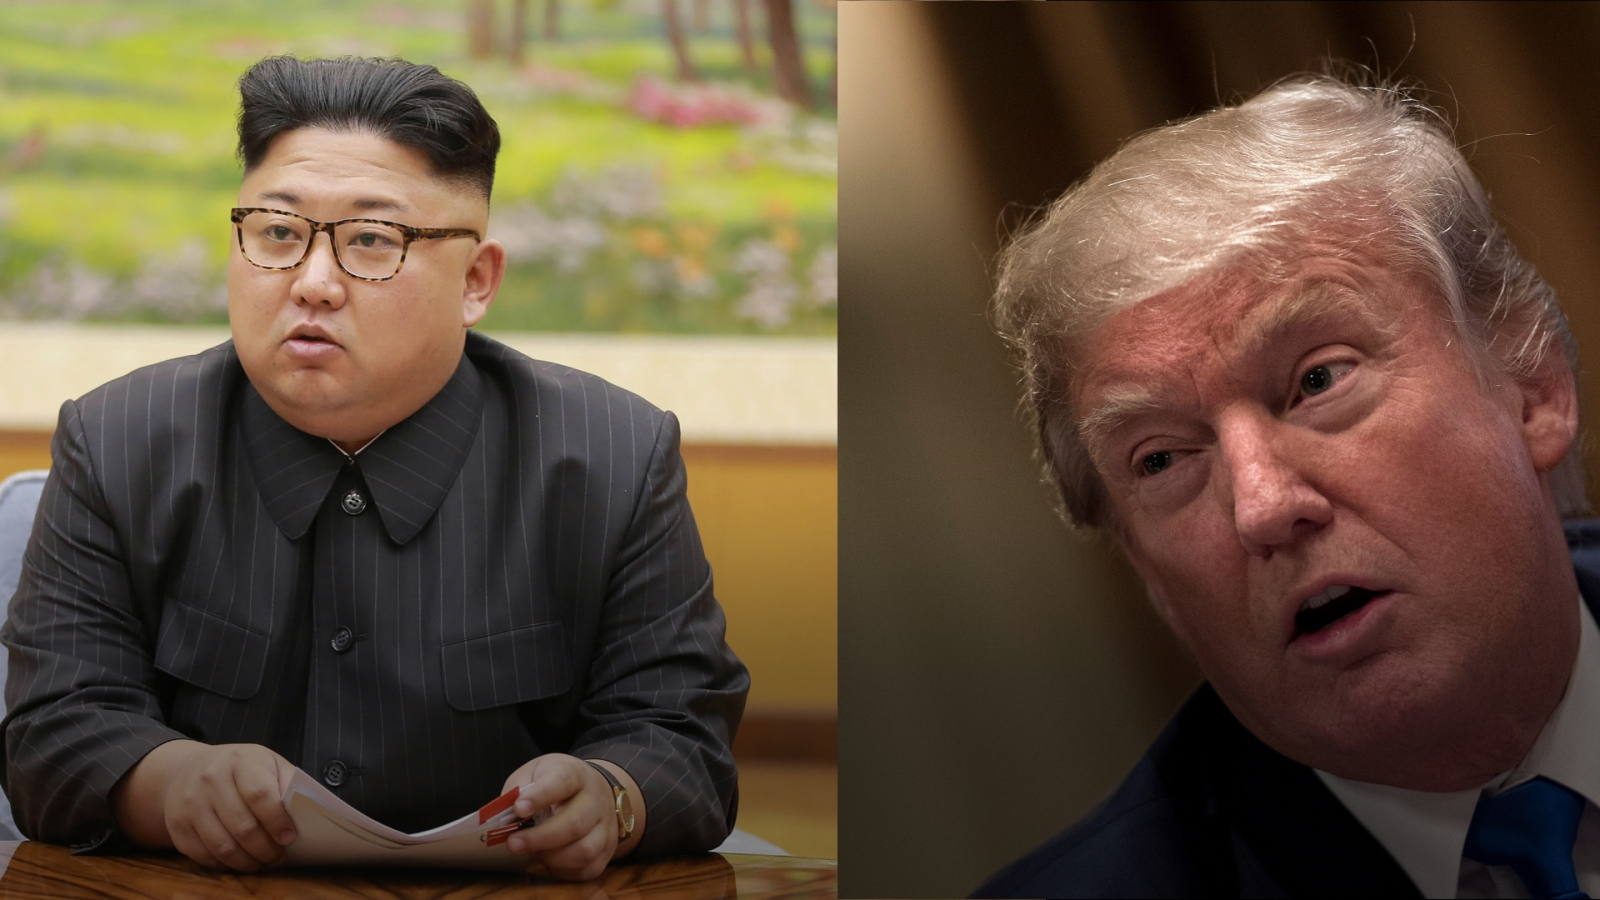 north-korea-calls-trump-barking-dog-as-war-of-words-escalates